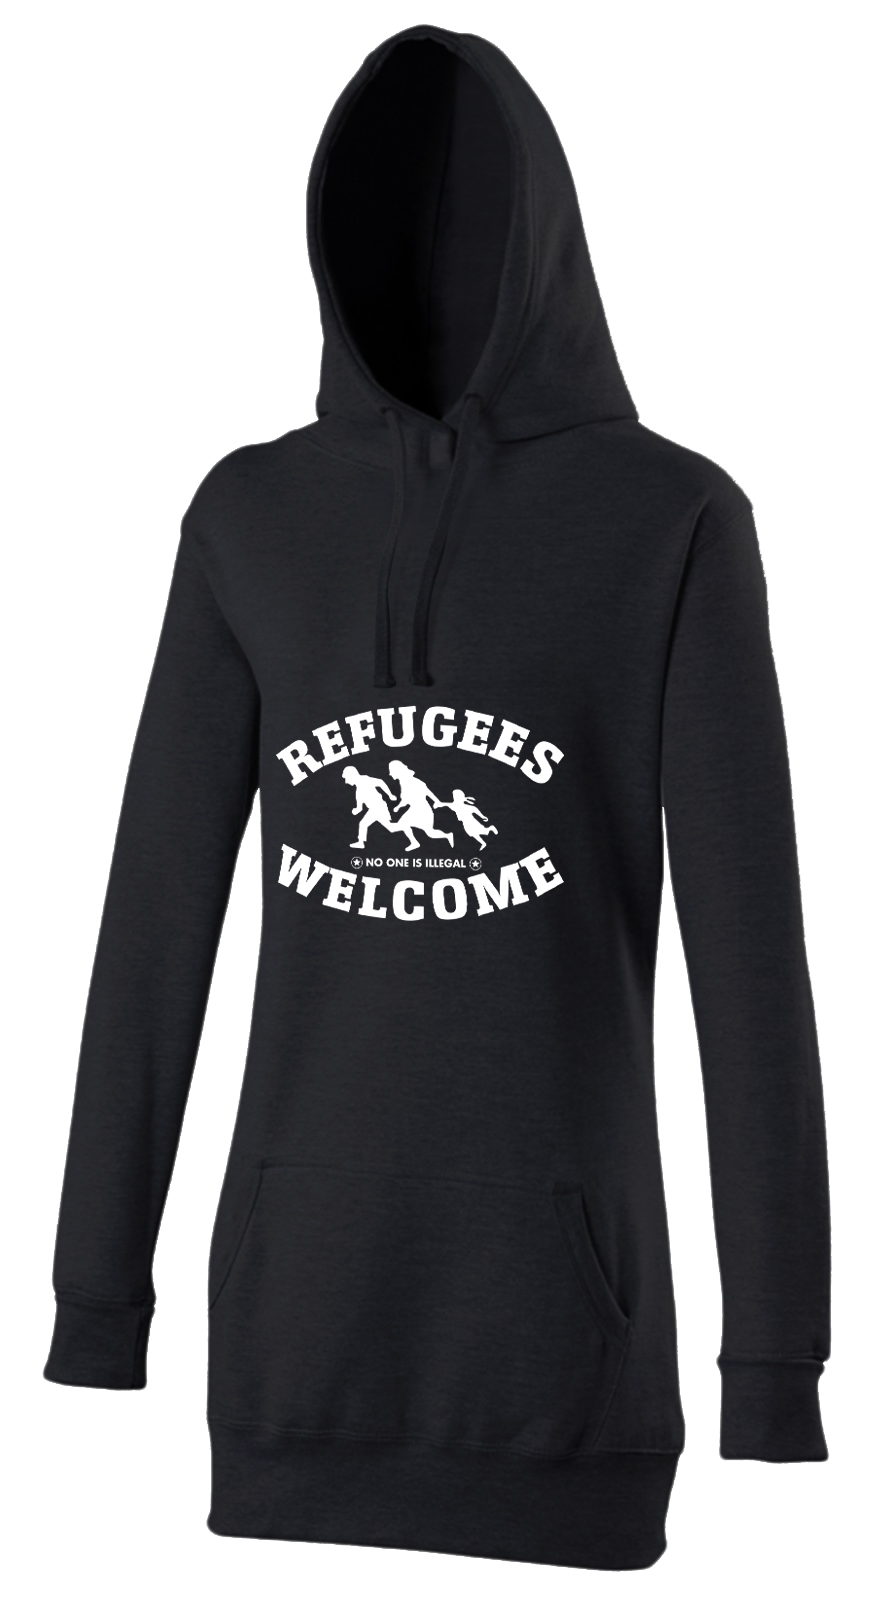 refugees welcome damen hoody schwarz mit wei er aufschrift. Black Bedroom Furniture Sets. Home Design Ideas